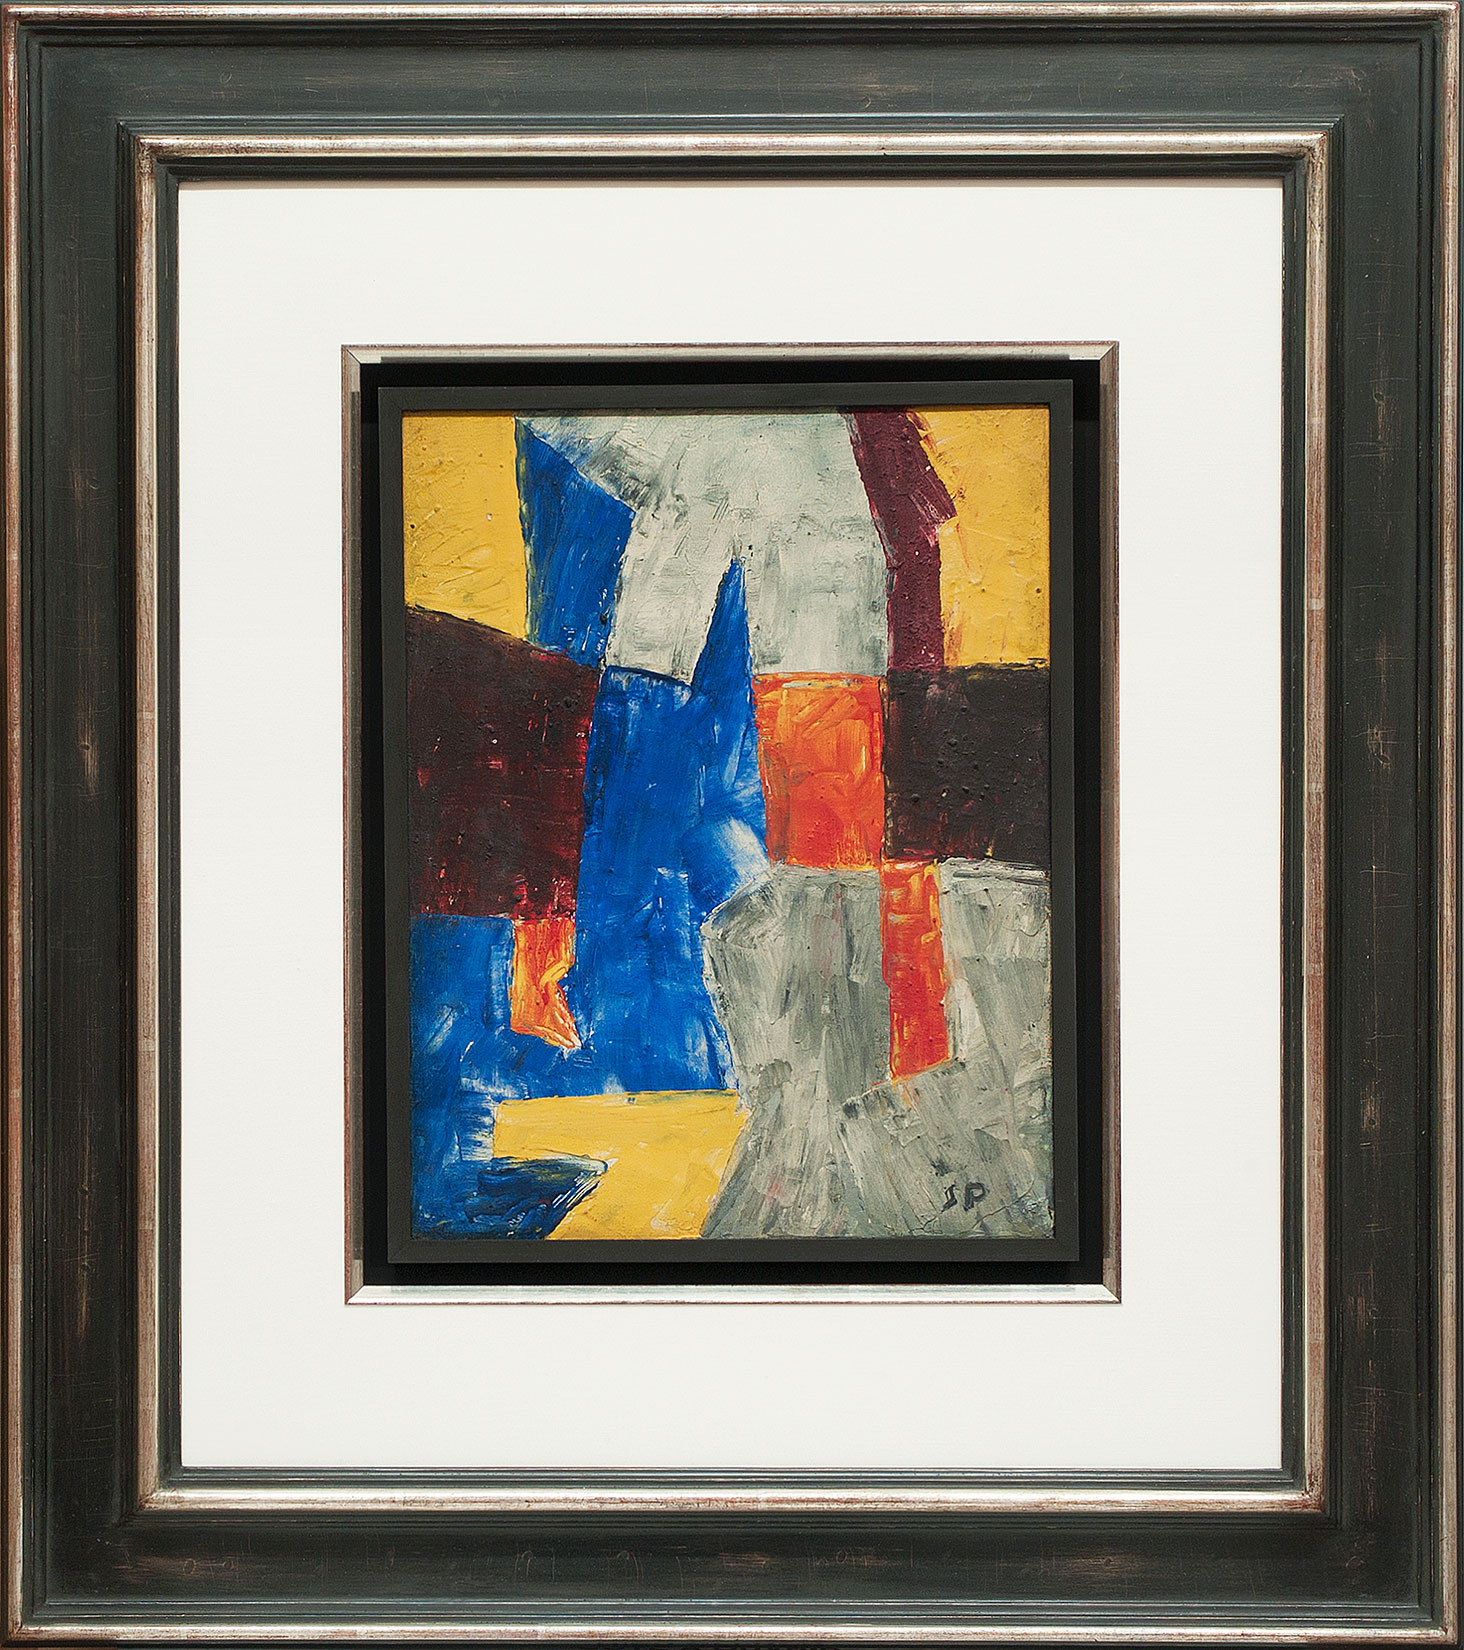 Serge Poliakoff « Composition multicolore » Galerie Française